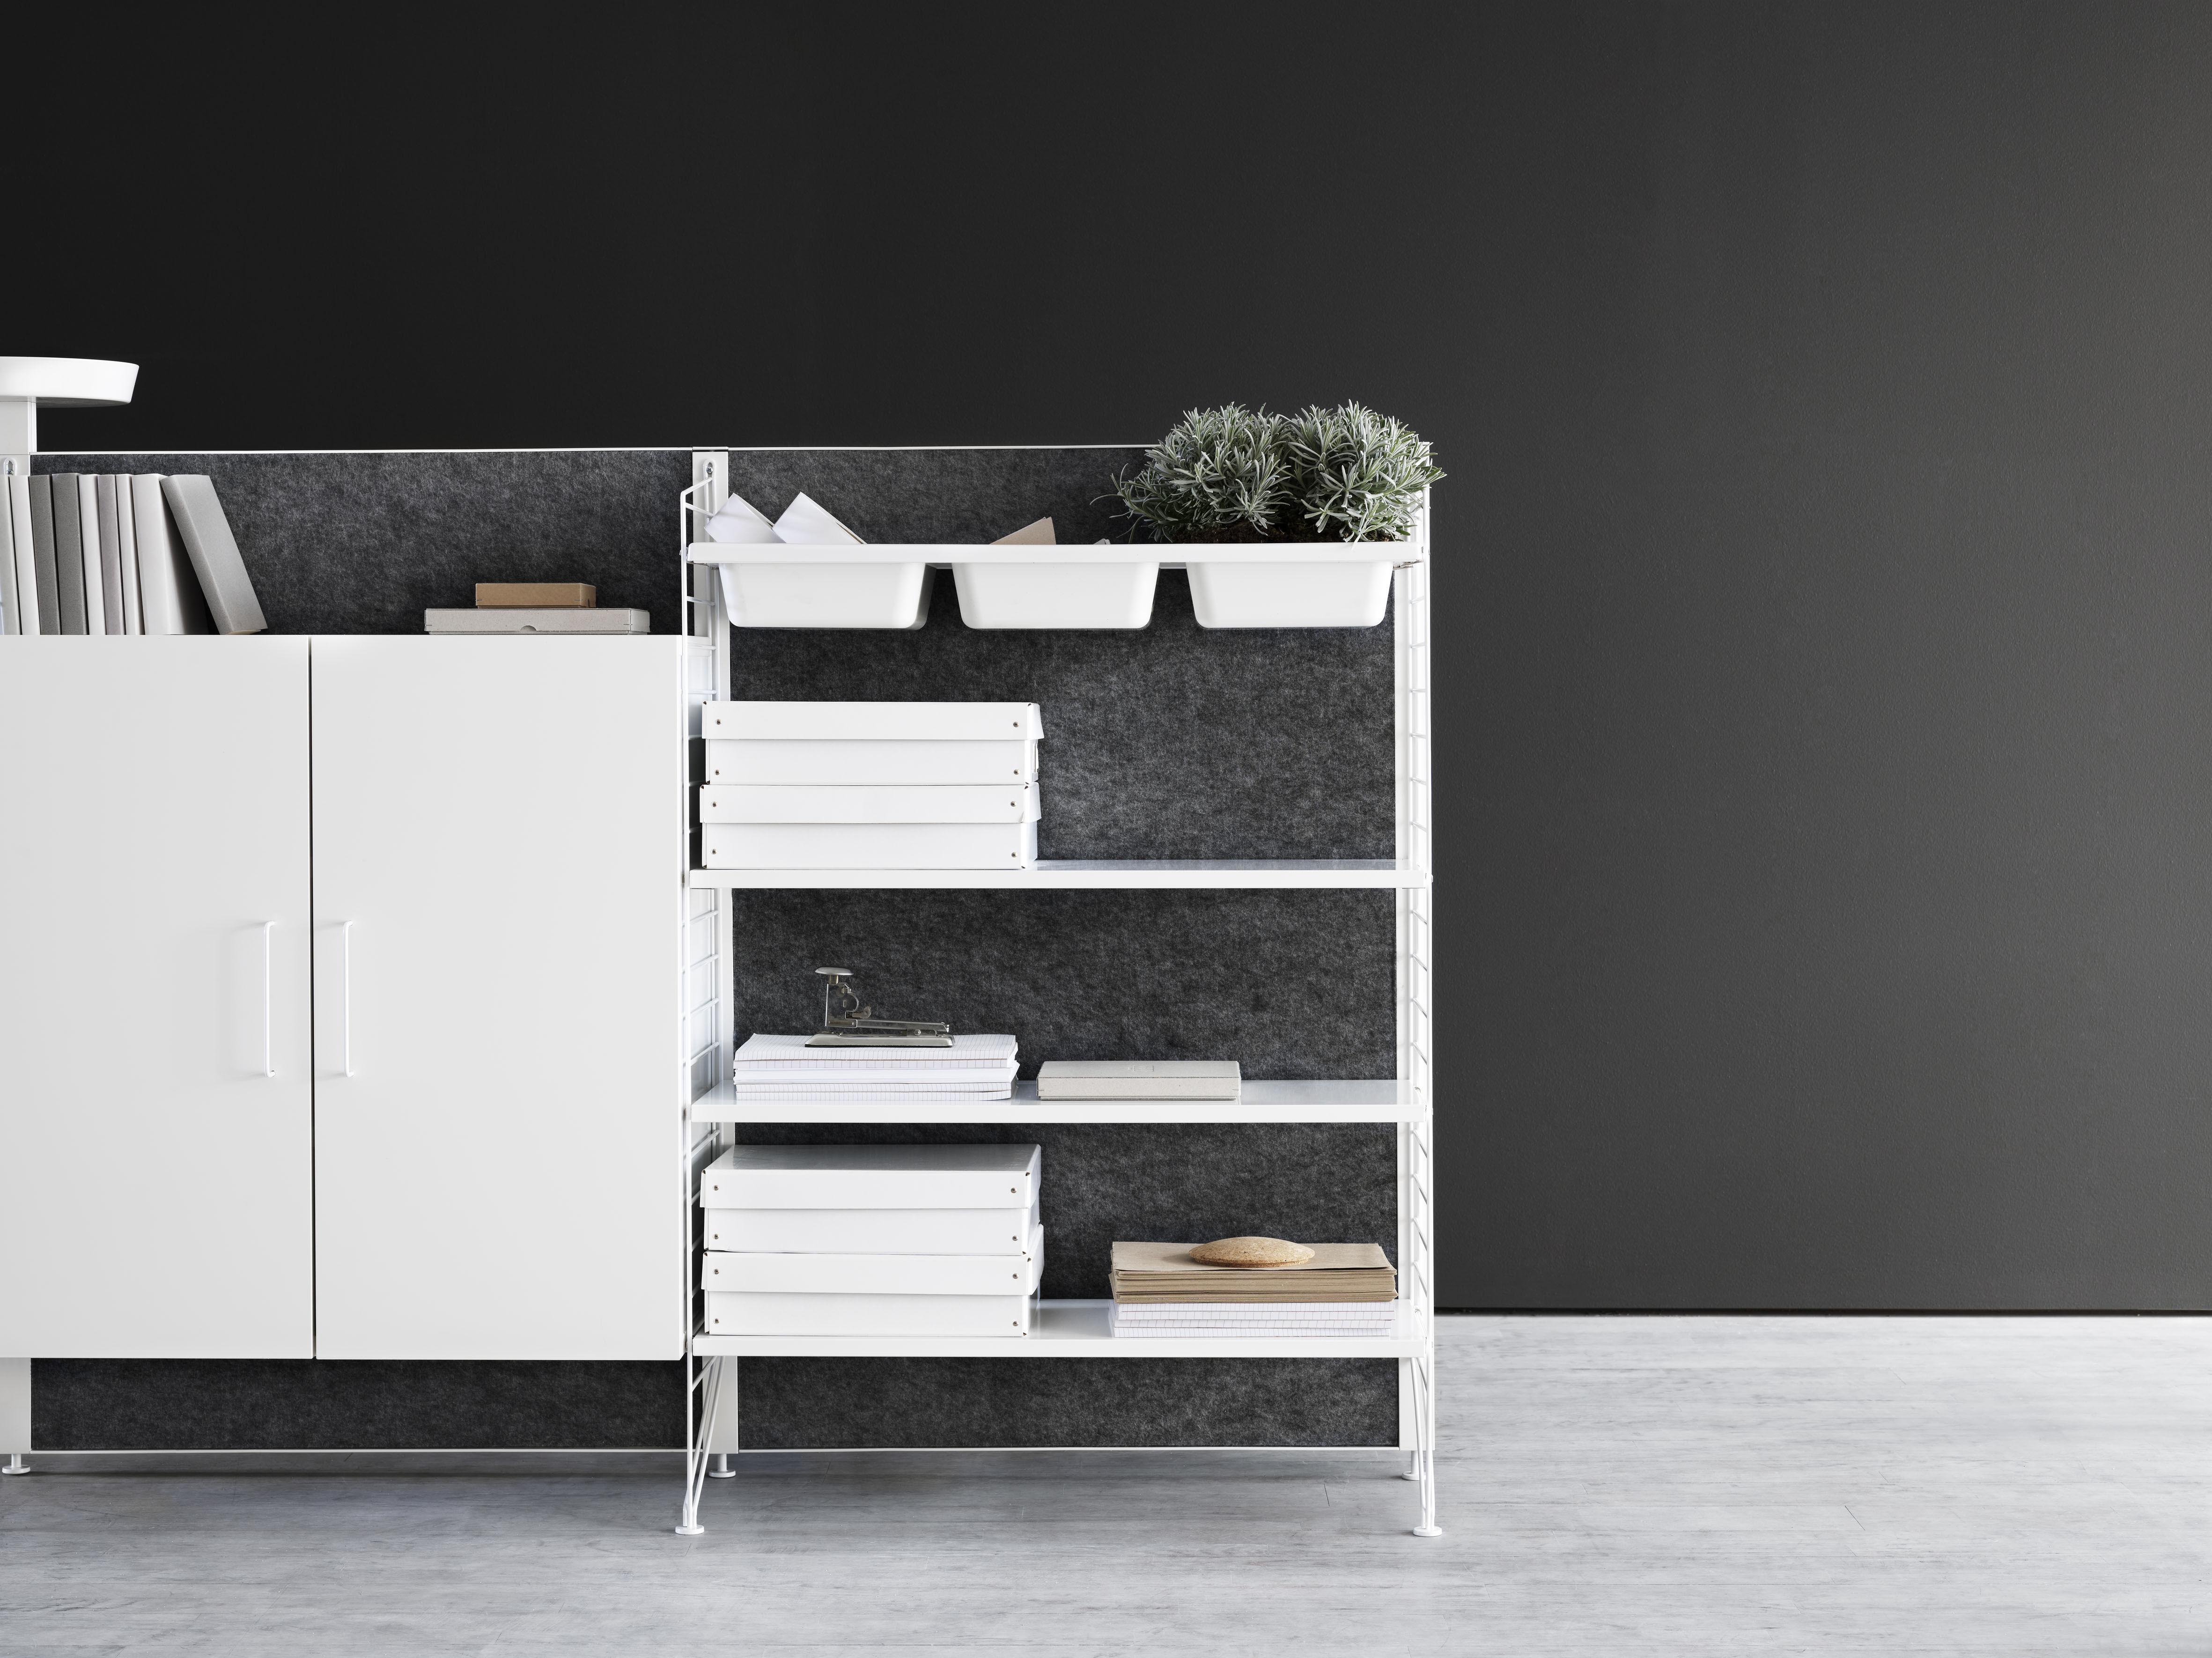 fa ade arri re string works pour meuble de rangement. Black Bedroom Furniture Sets. Home Design Ideas